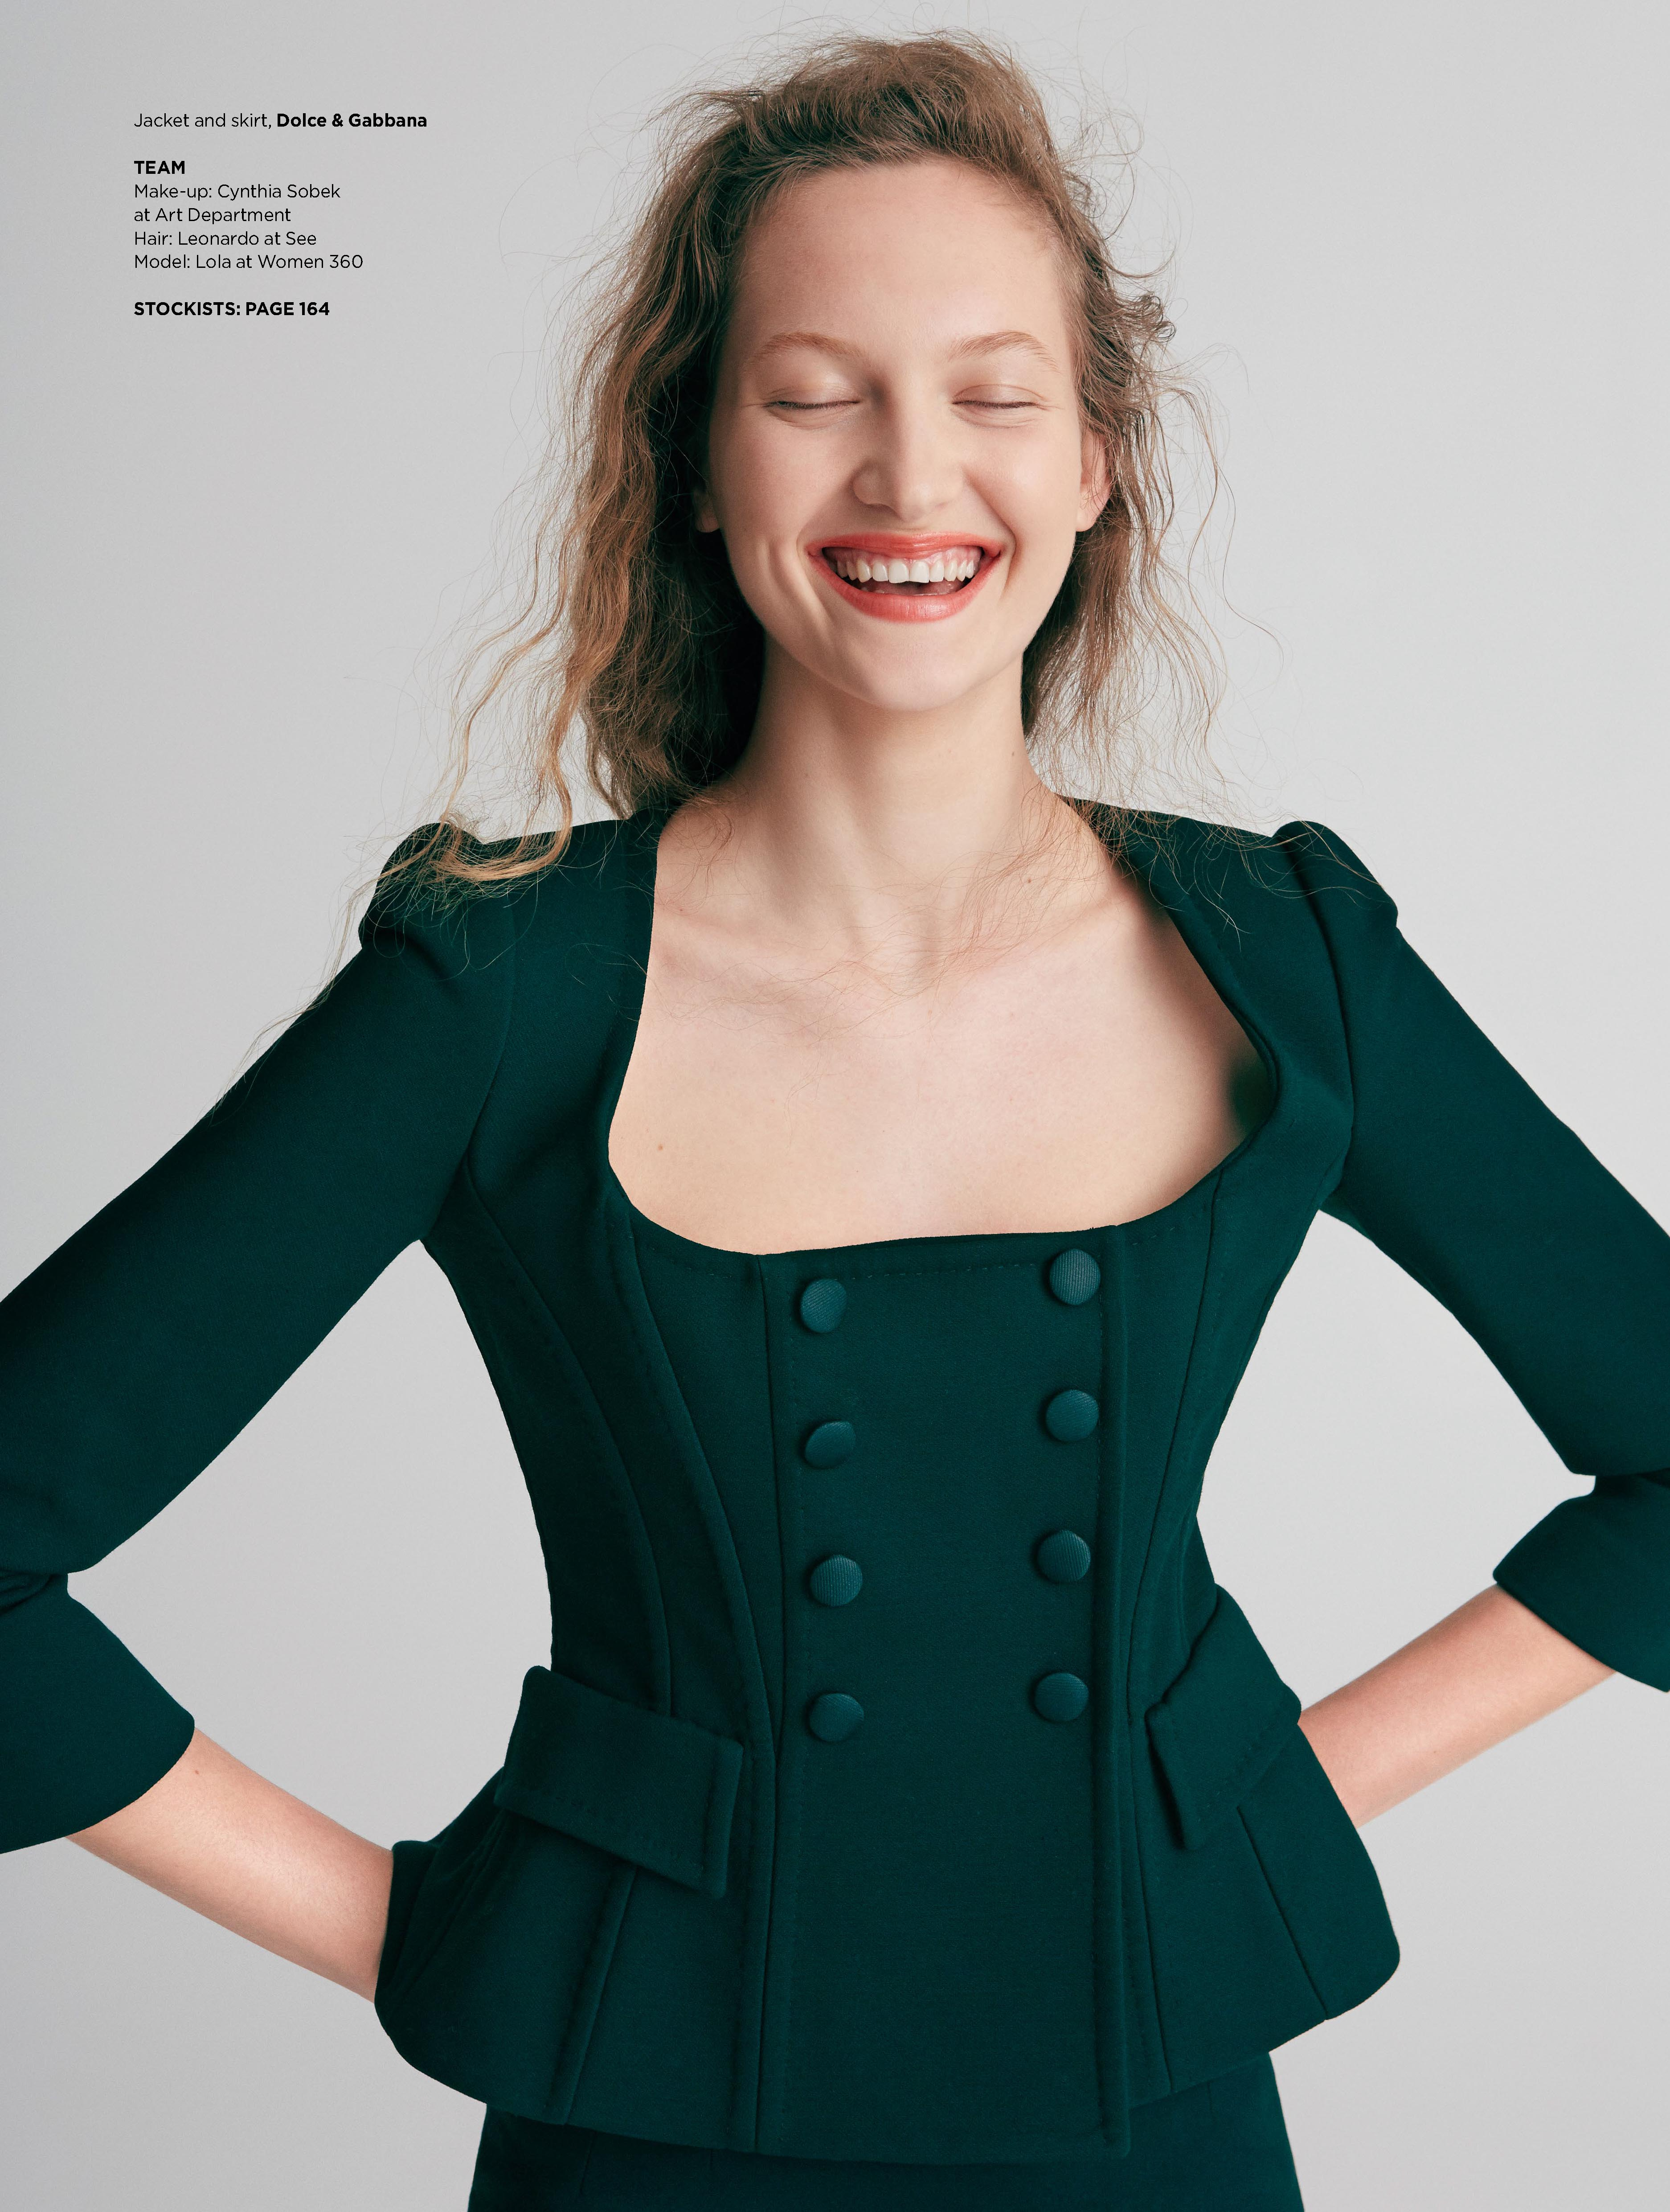 Fashion Story Country & Town House Model Lola Votruba I Greg Sorensen I Fashion & Beauty Photographer I NYC